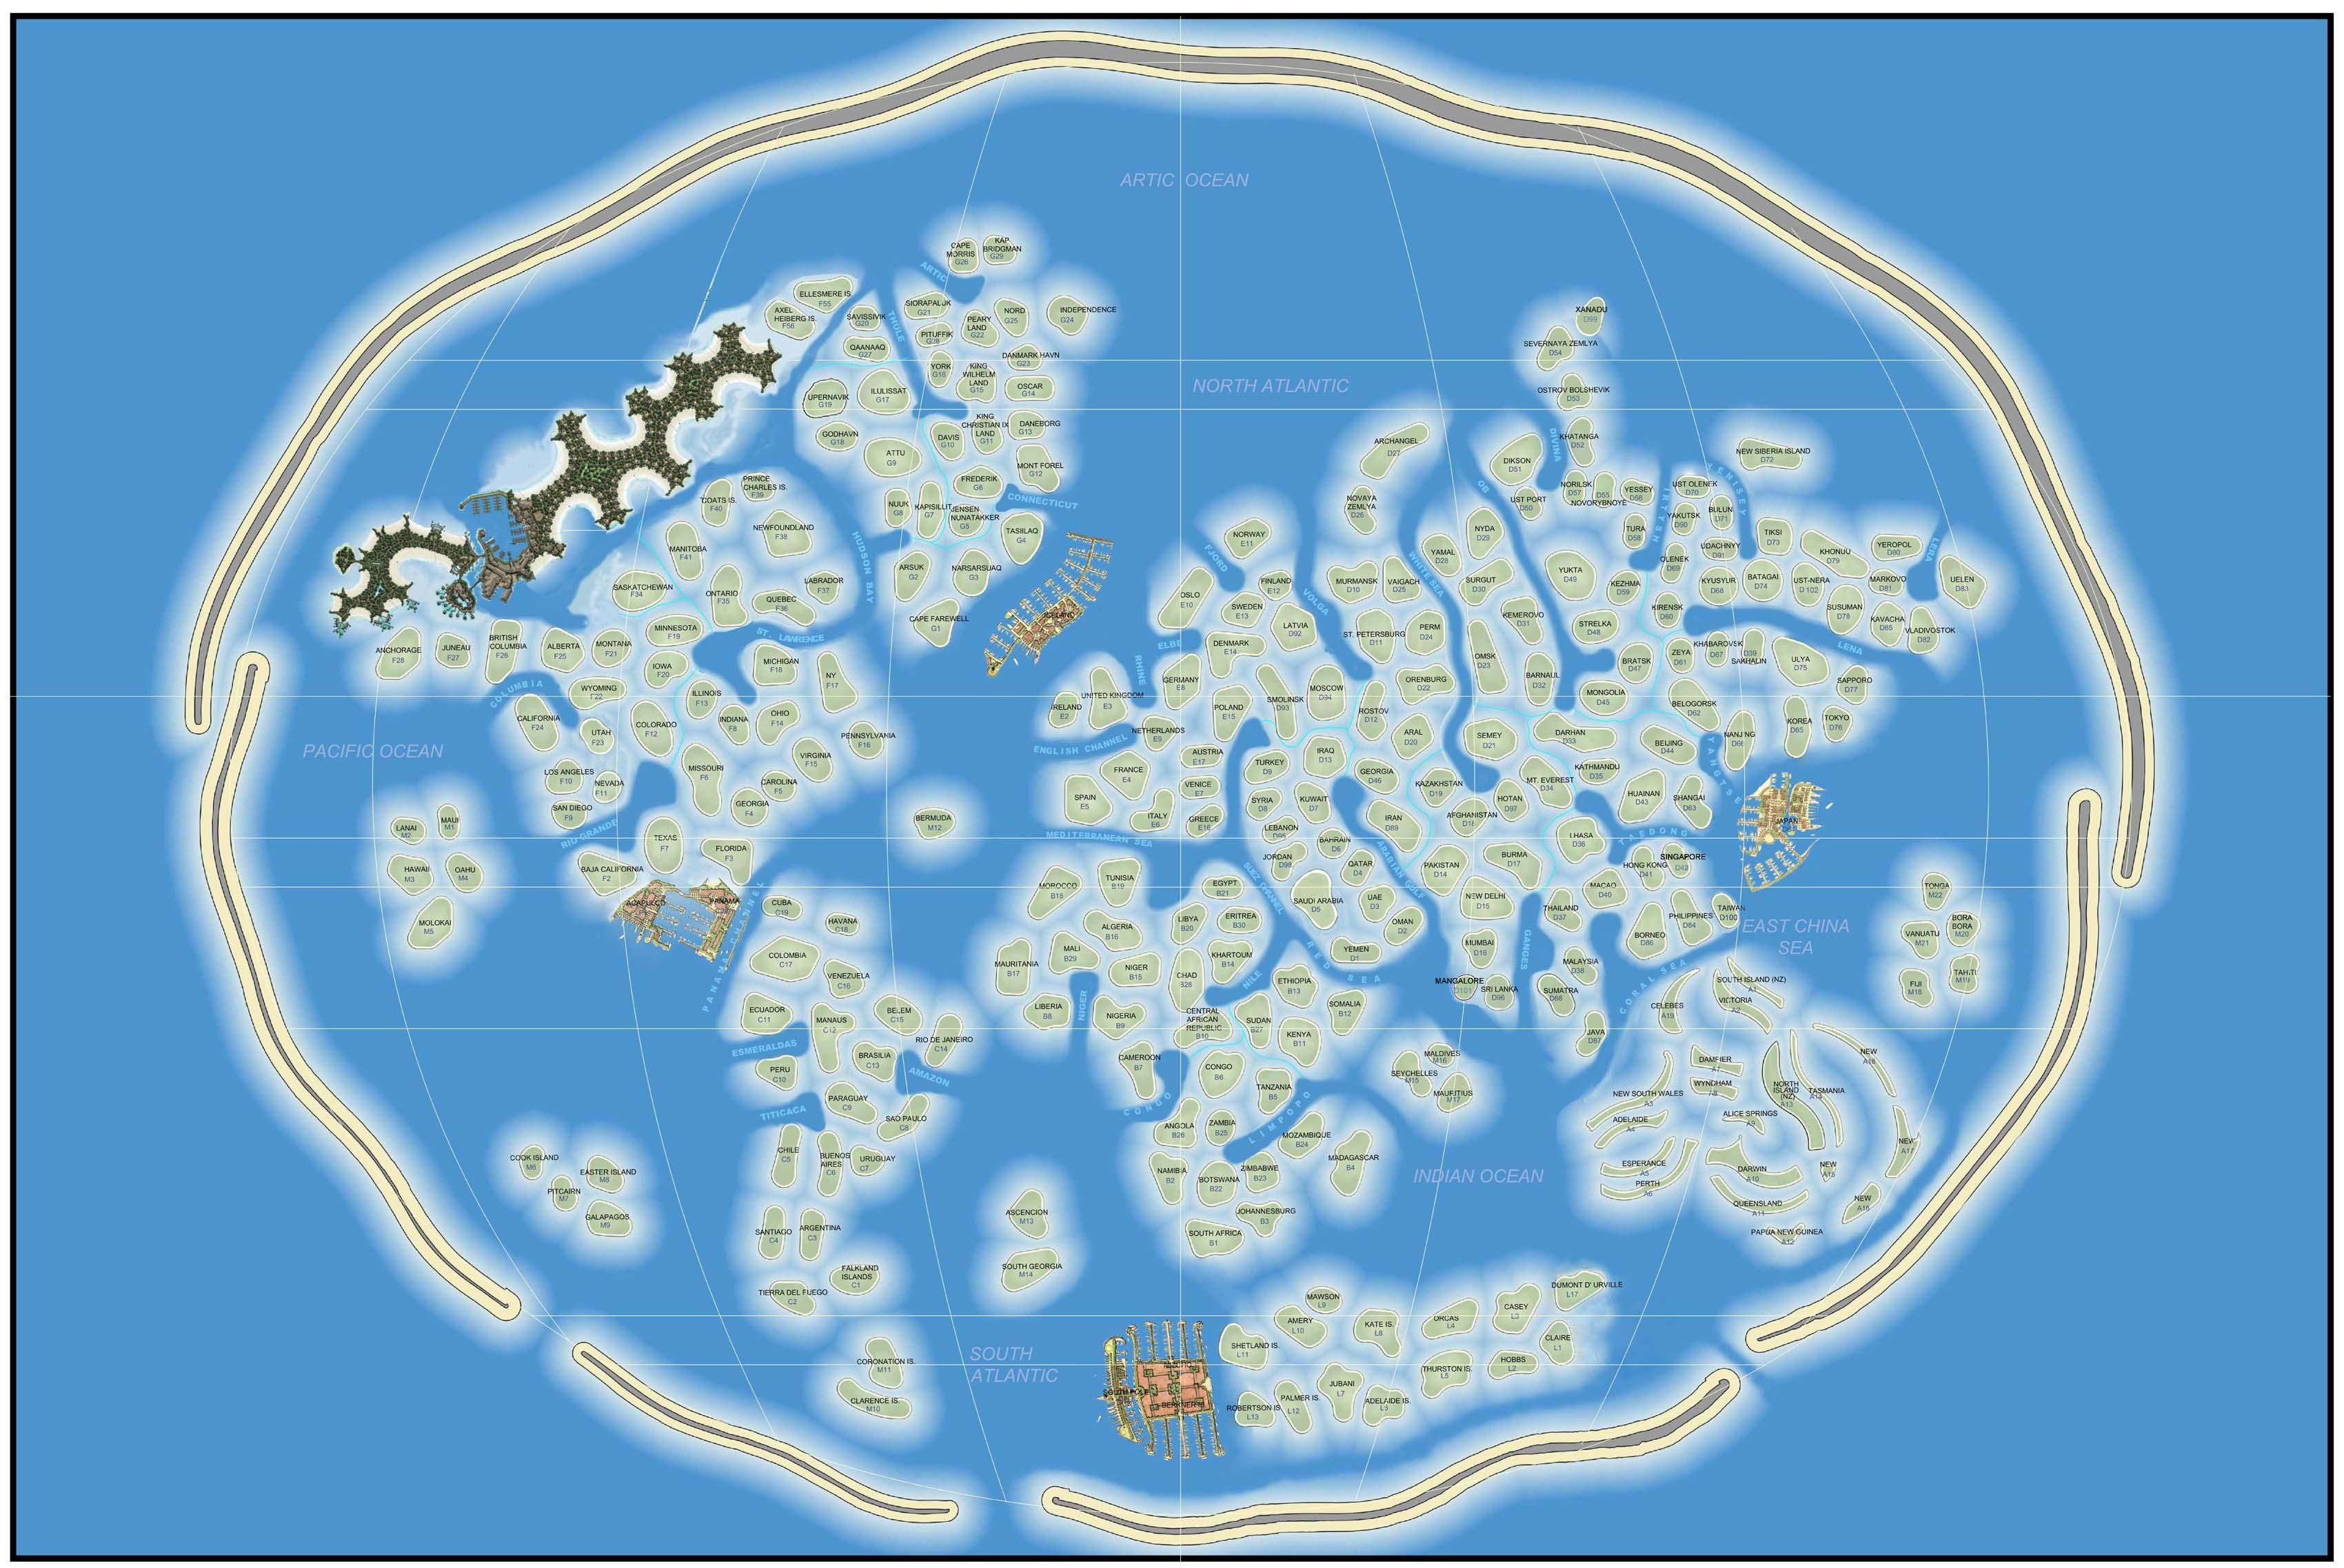 Dubai world map Insel - Weltkarte, Insel, Dubai (Vereinigte ...